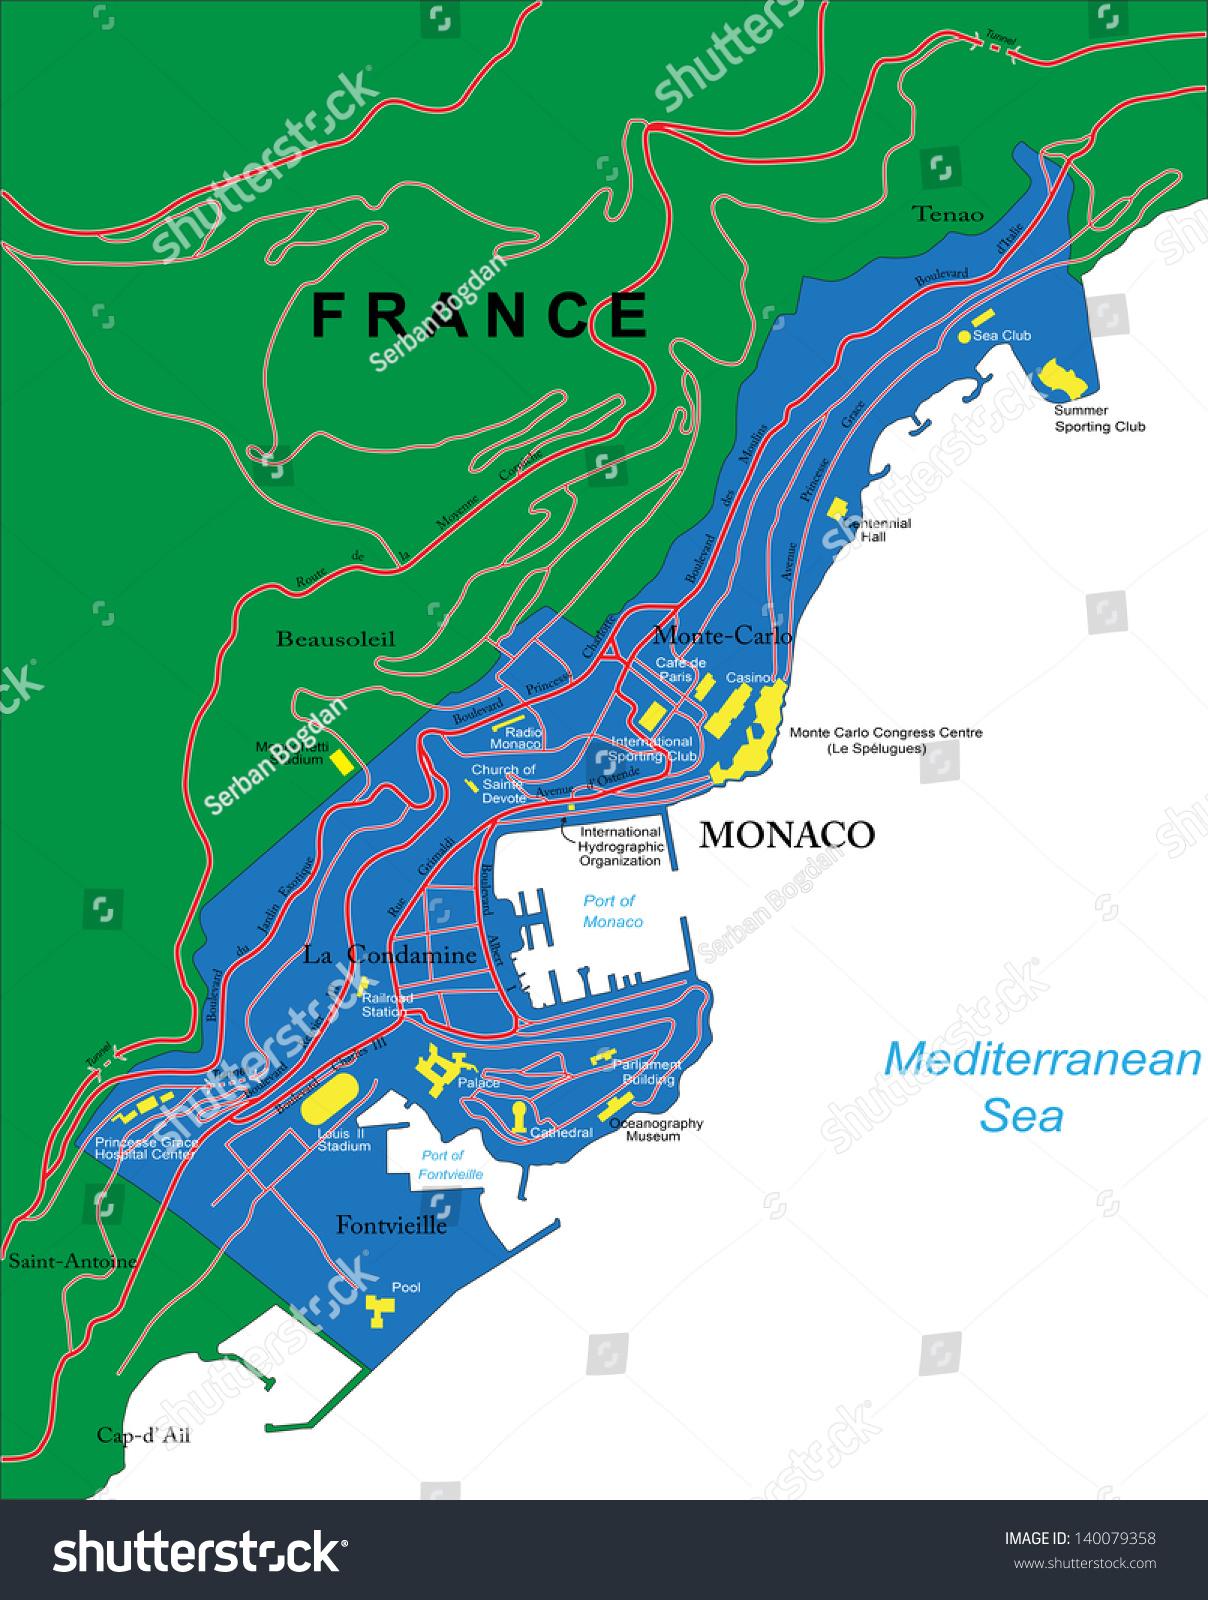 monaco map stock vector   shutterstock - monaco map